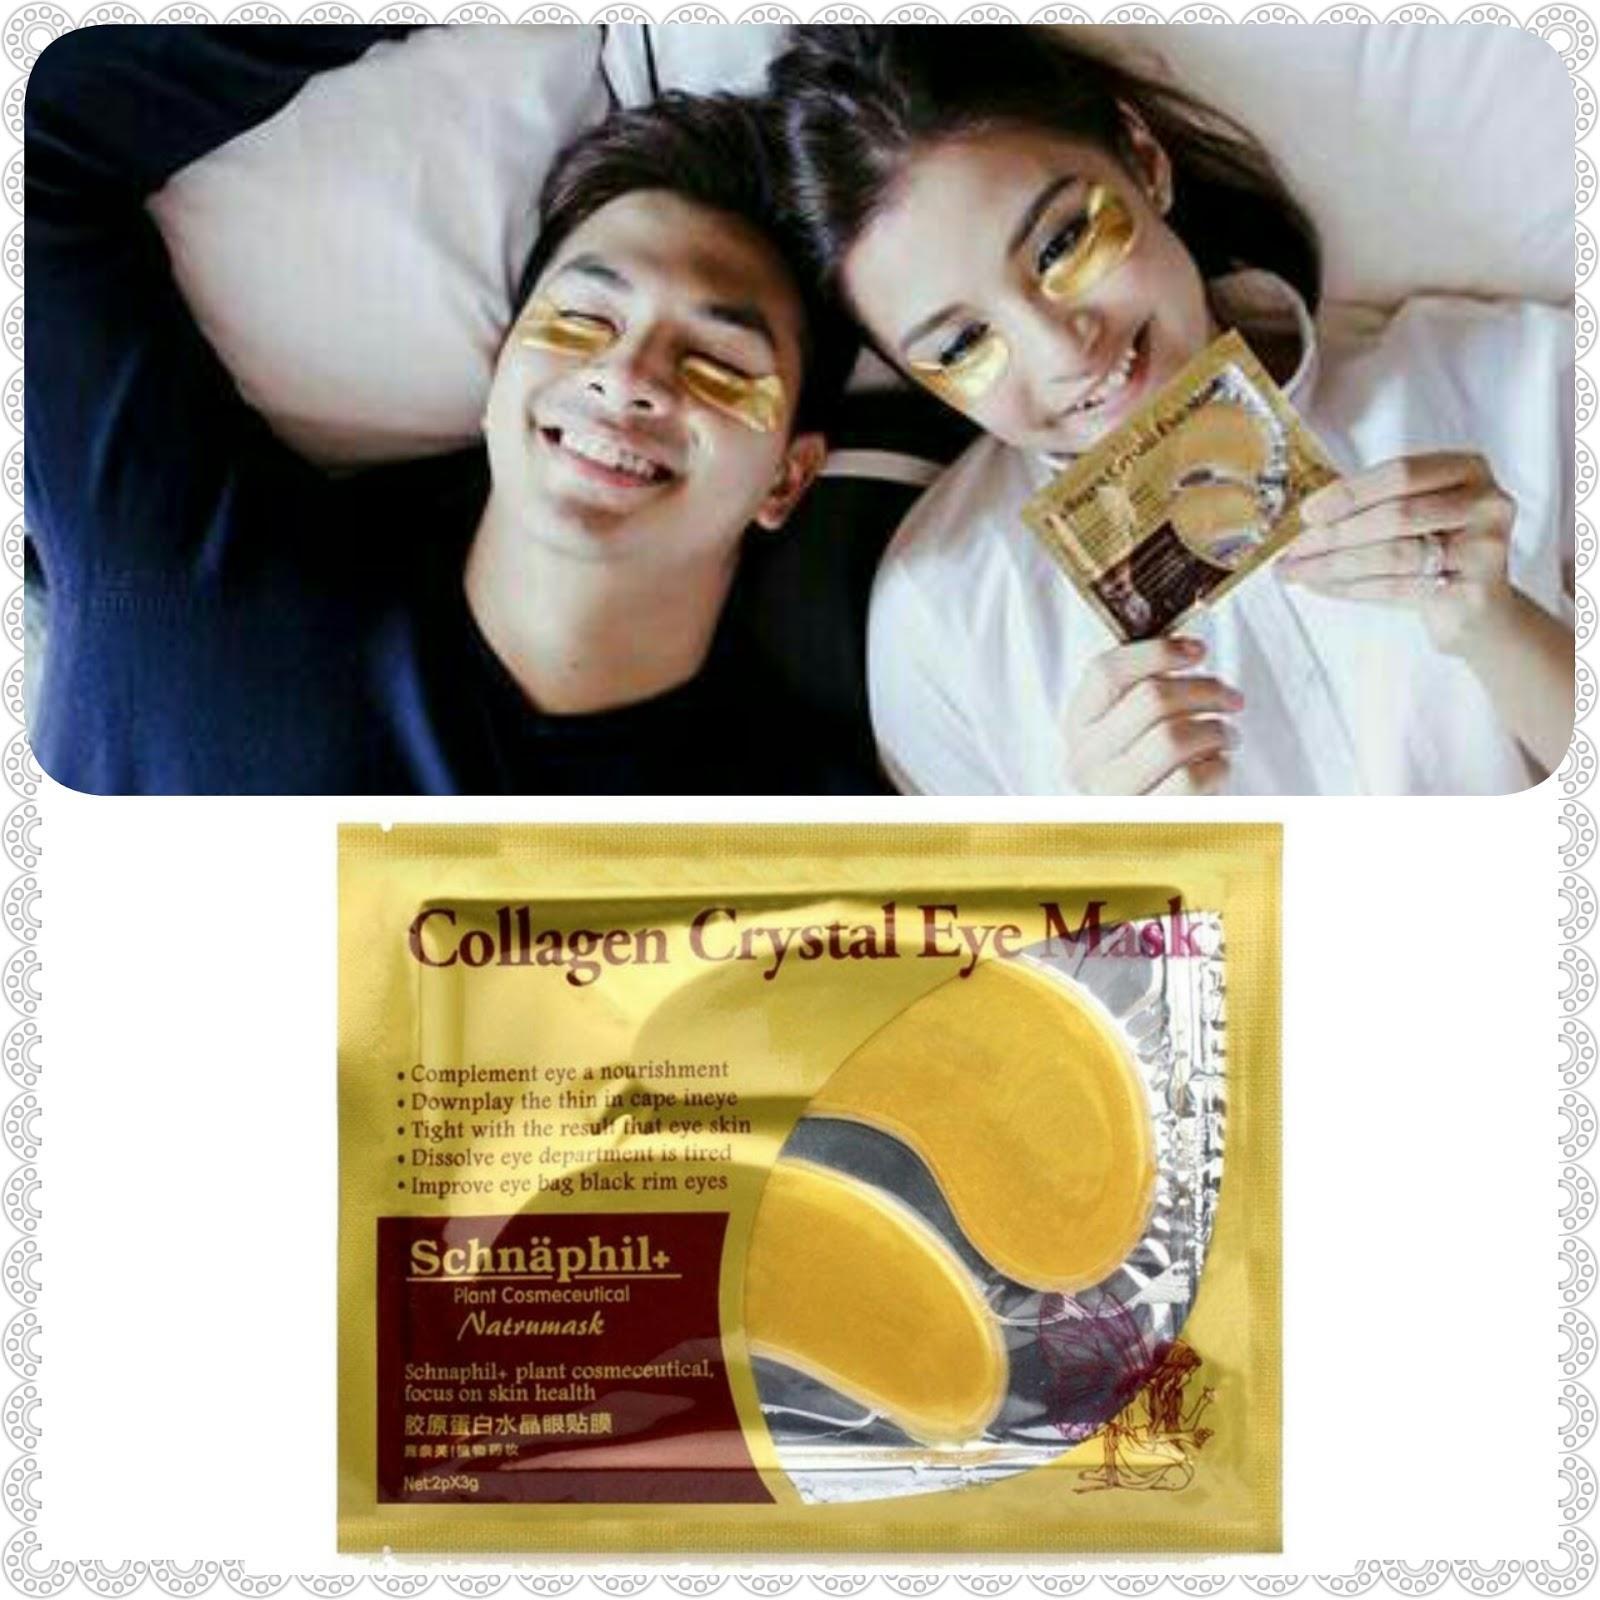 Collagen Crystal Eye Mask Lazada Eyelid Patch Gold Masker Mata Emas 1 Pcs